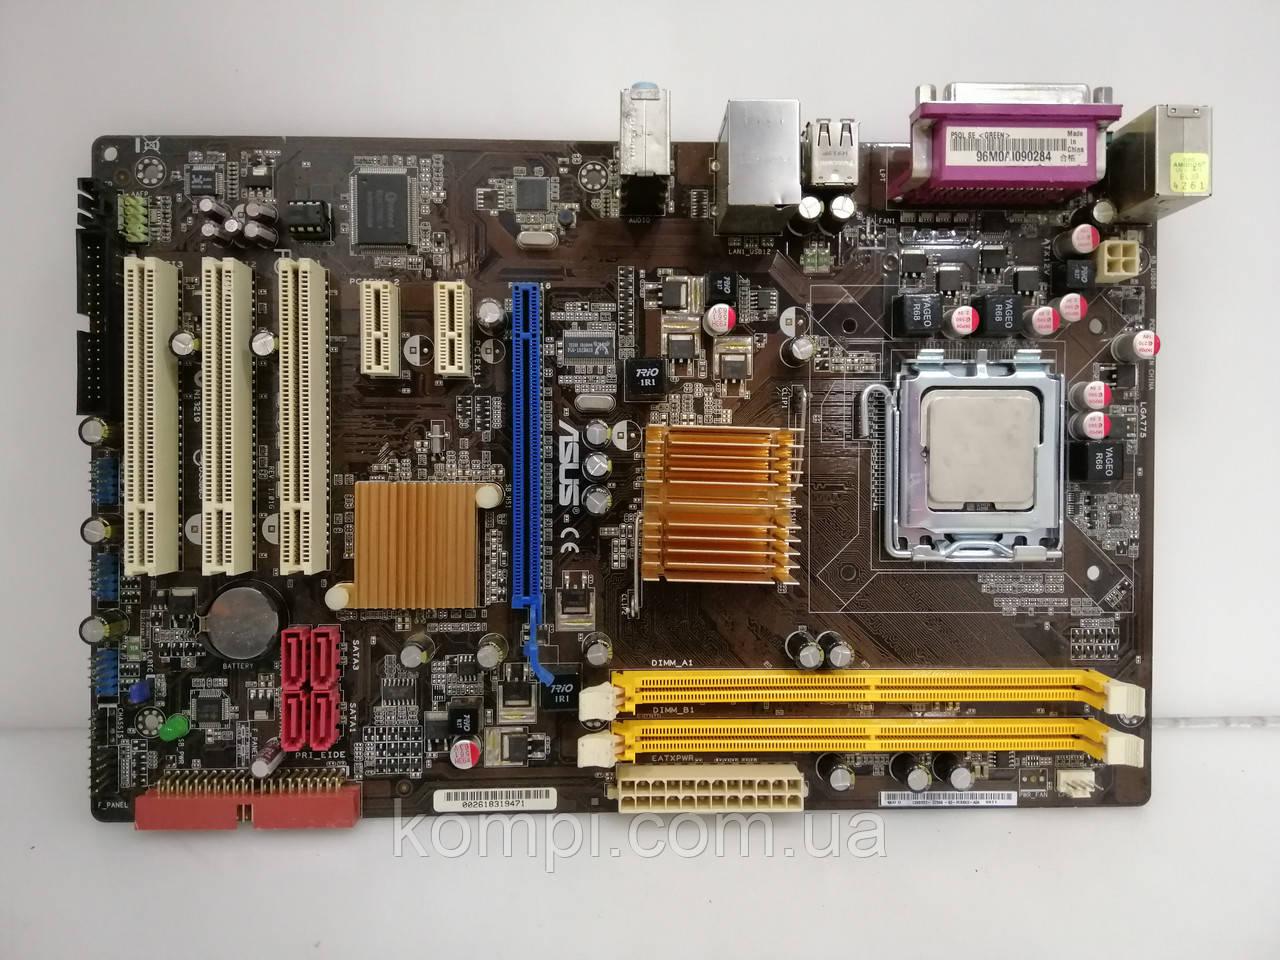 Материнская плата Asus P5QL-SE +e7300 s775 DDR2